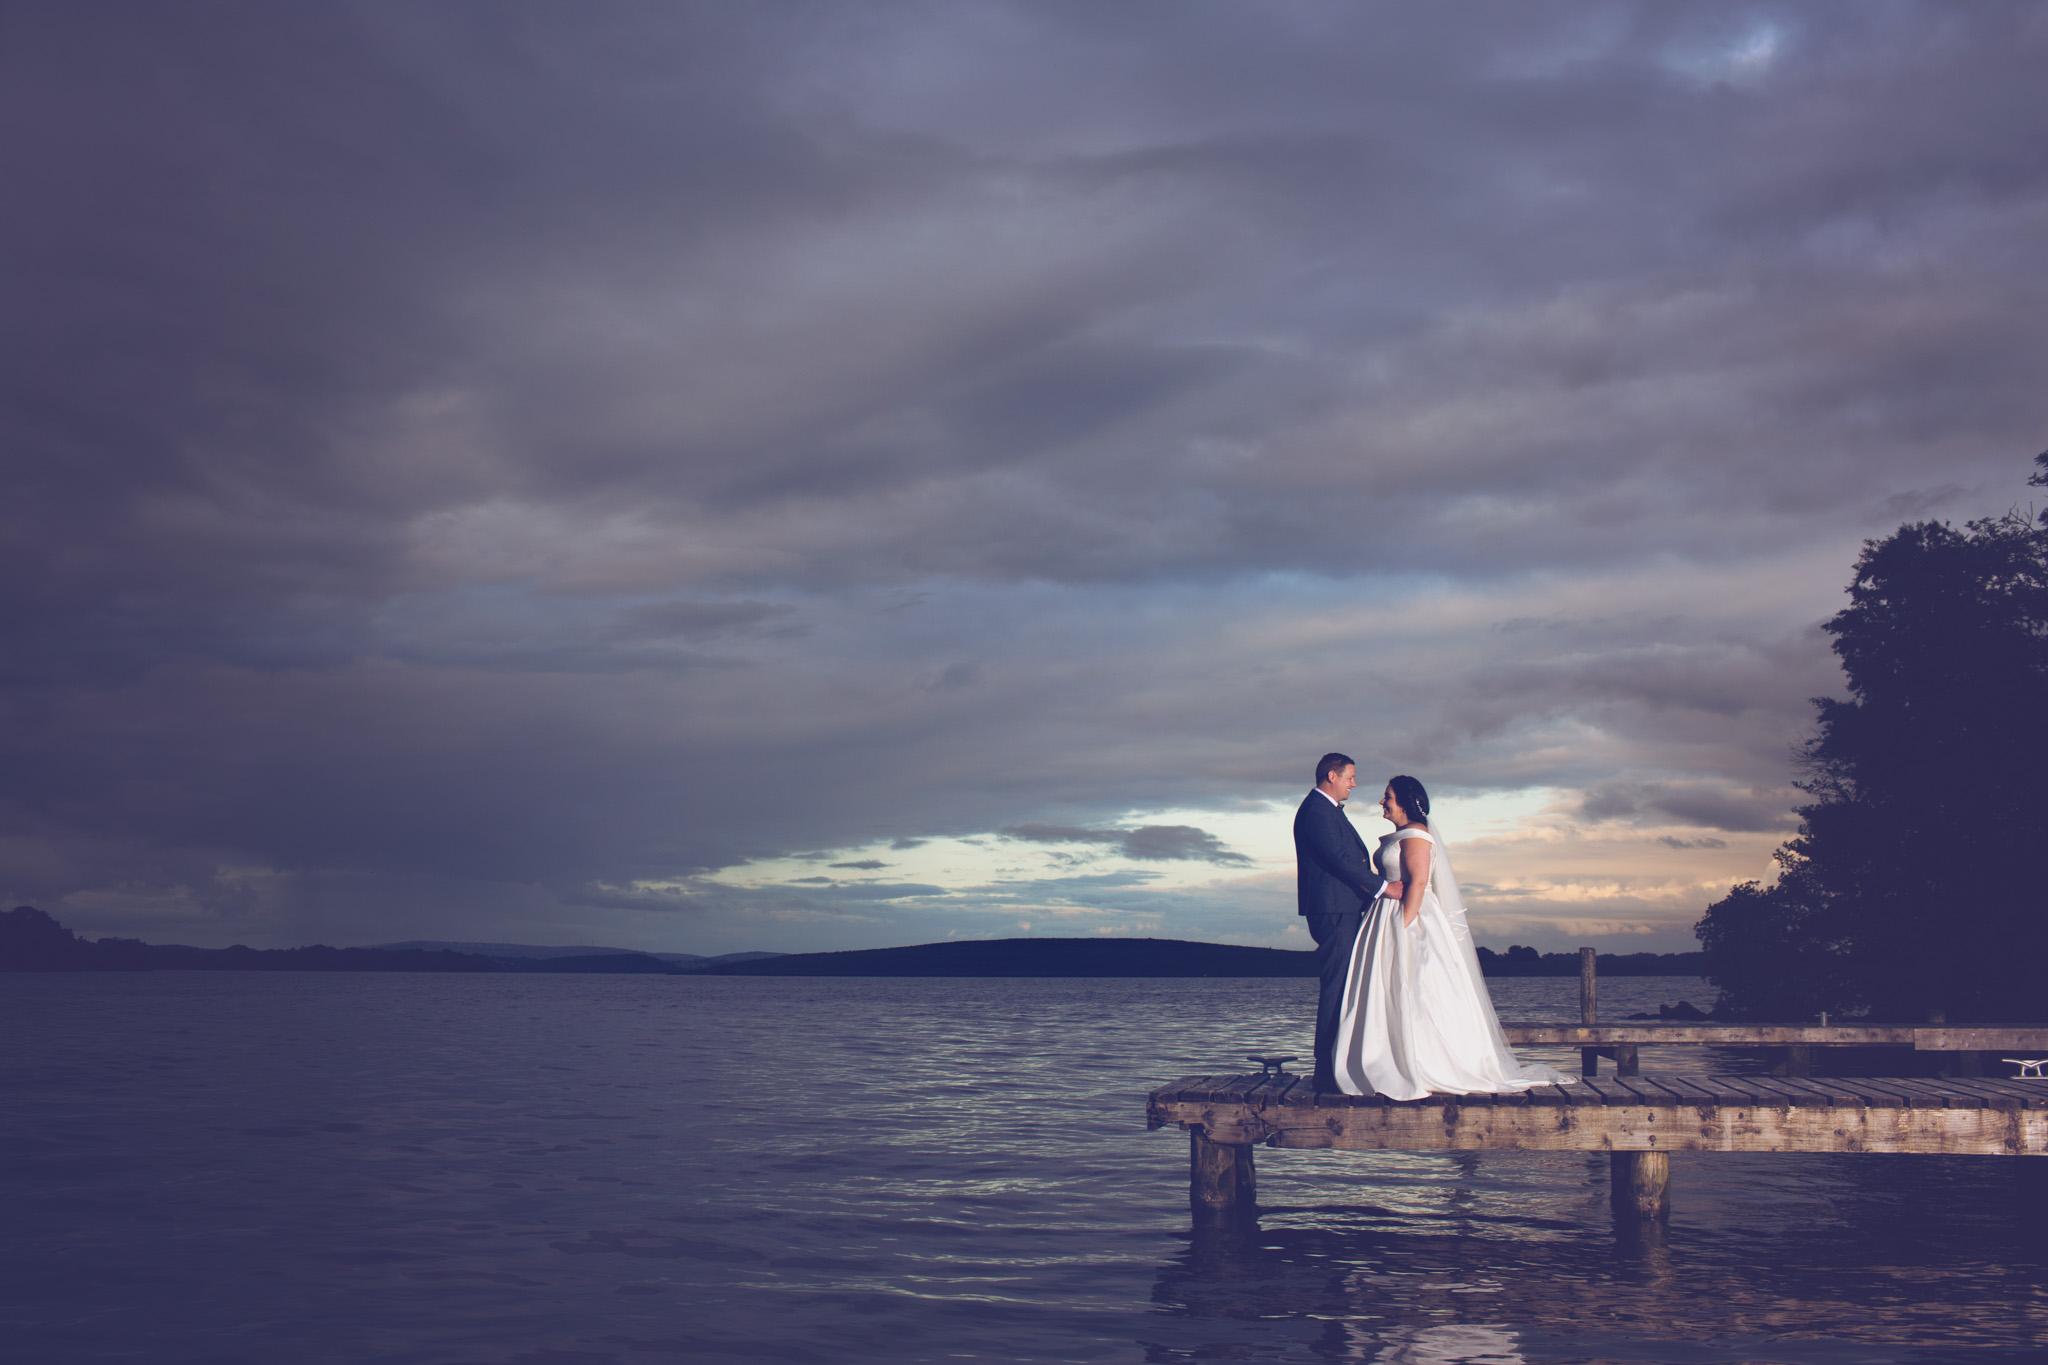 Mark_Barnes_Northern_Ireland_Wedding_Photography_Lusty_Beg_Wedding_Photography_Hayley&Brian-39.jpg